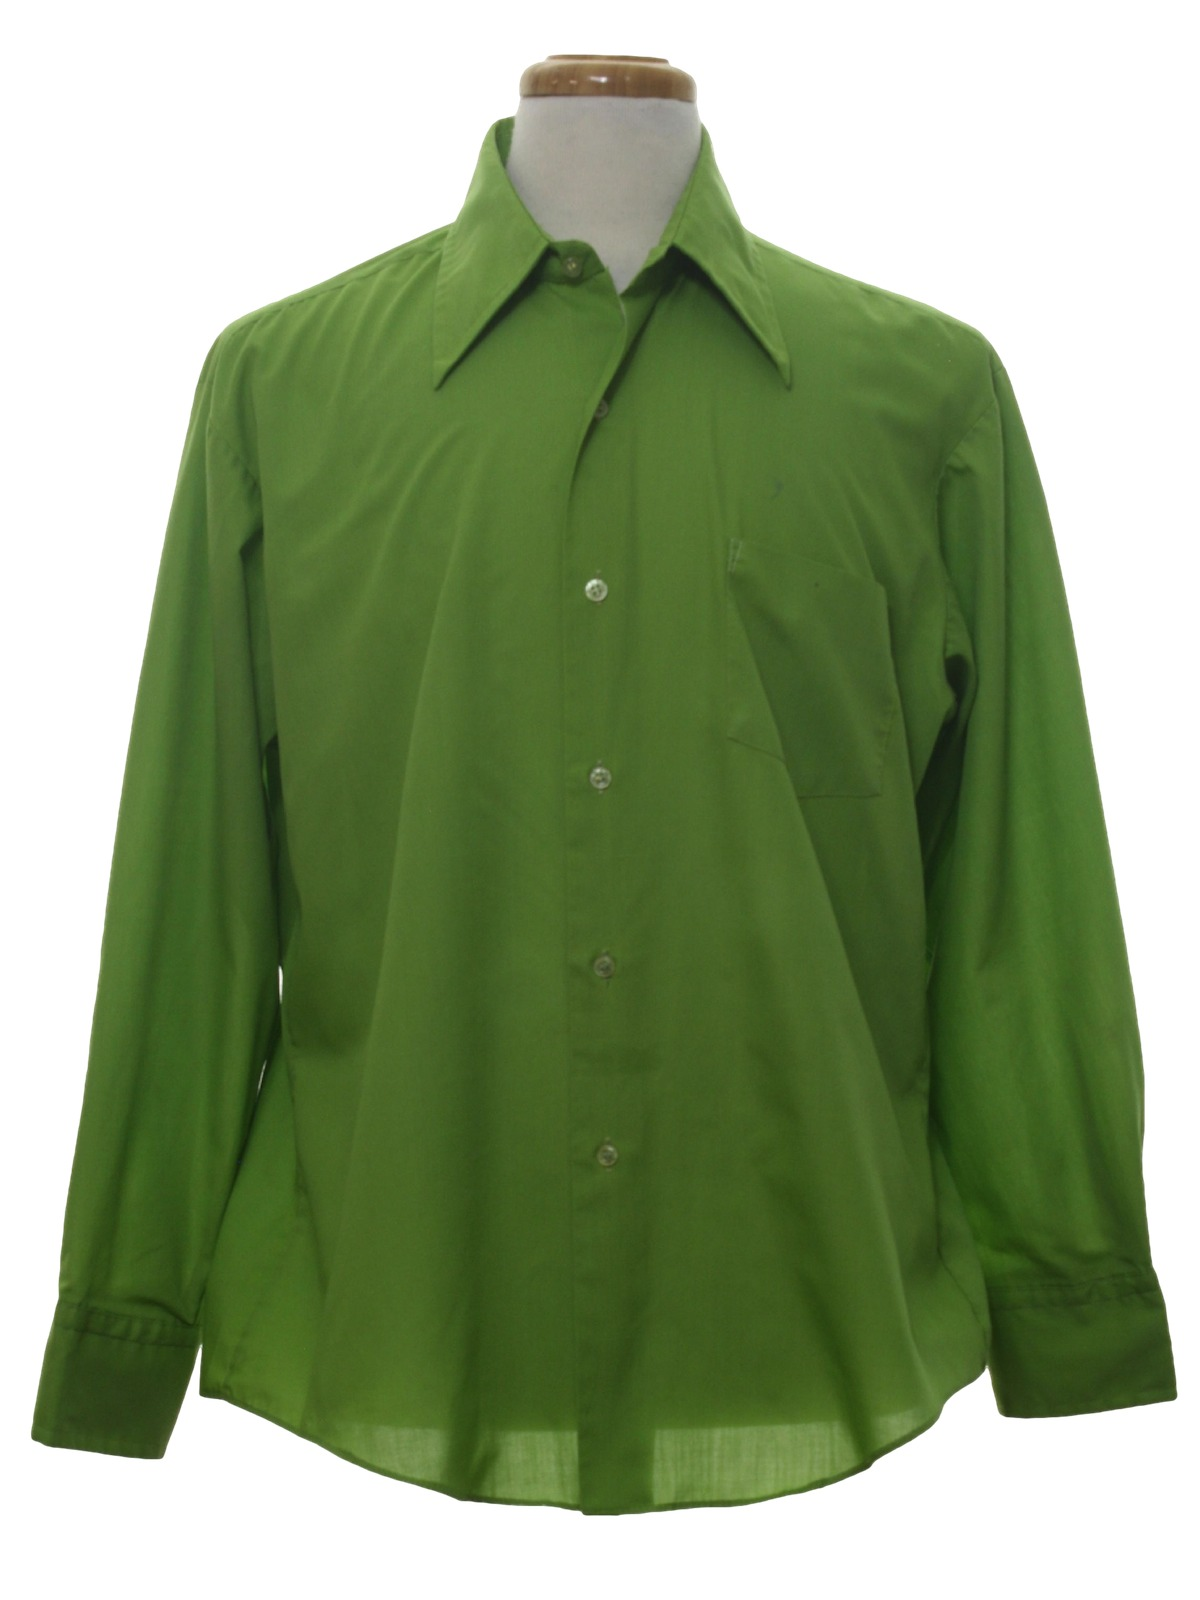 Vintage kmart 1970s shirt 70s kmart mens avocado for Kmart button up shirts